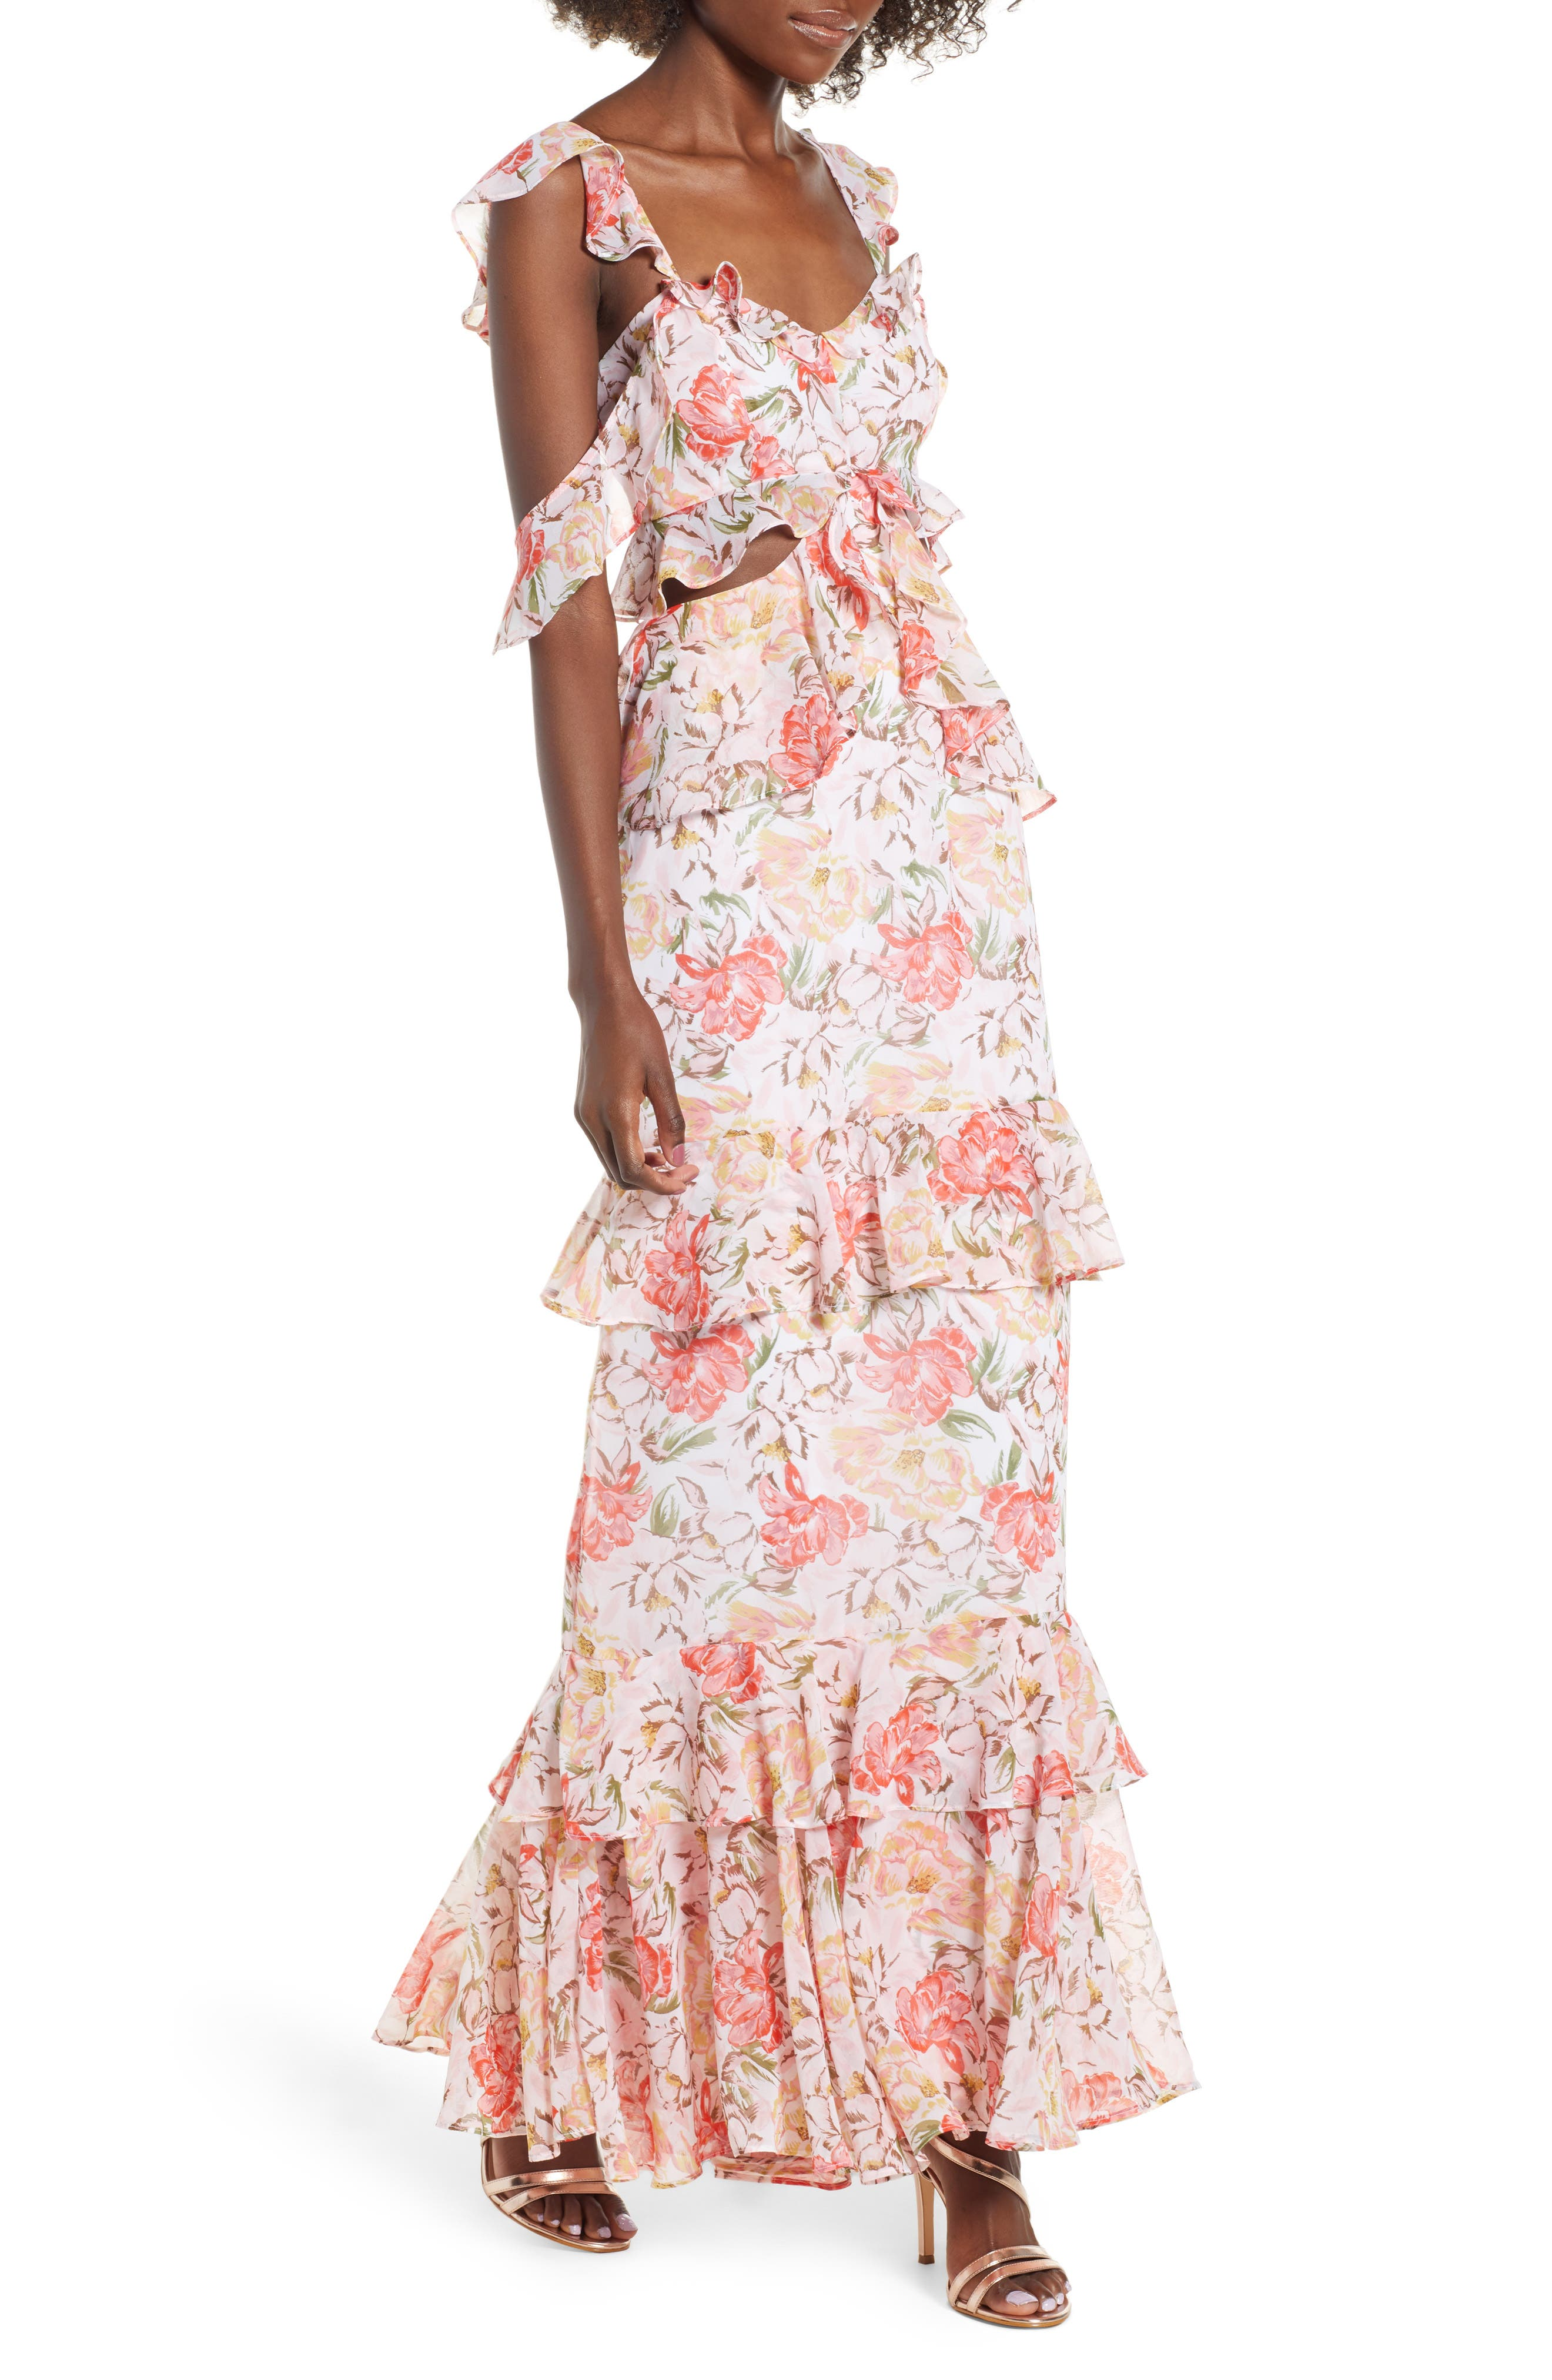 Milan Cut Out Ruffle Maxi Dress,                             Main thumbnail 1, color,                             Ivory Floral